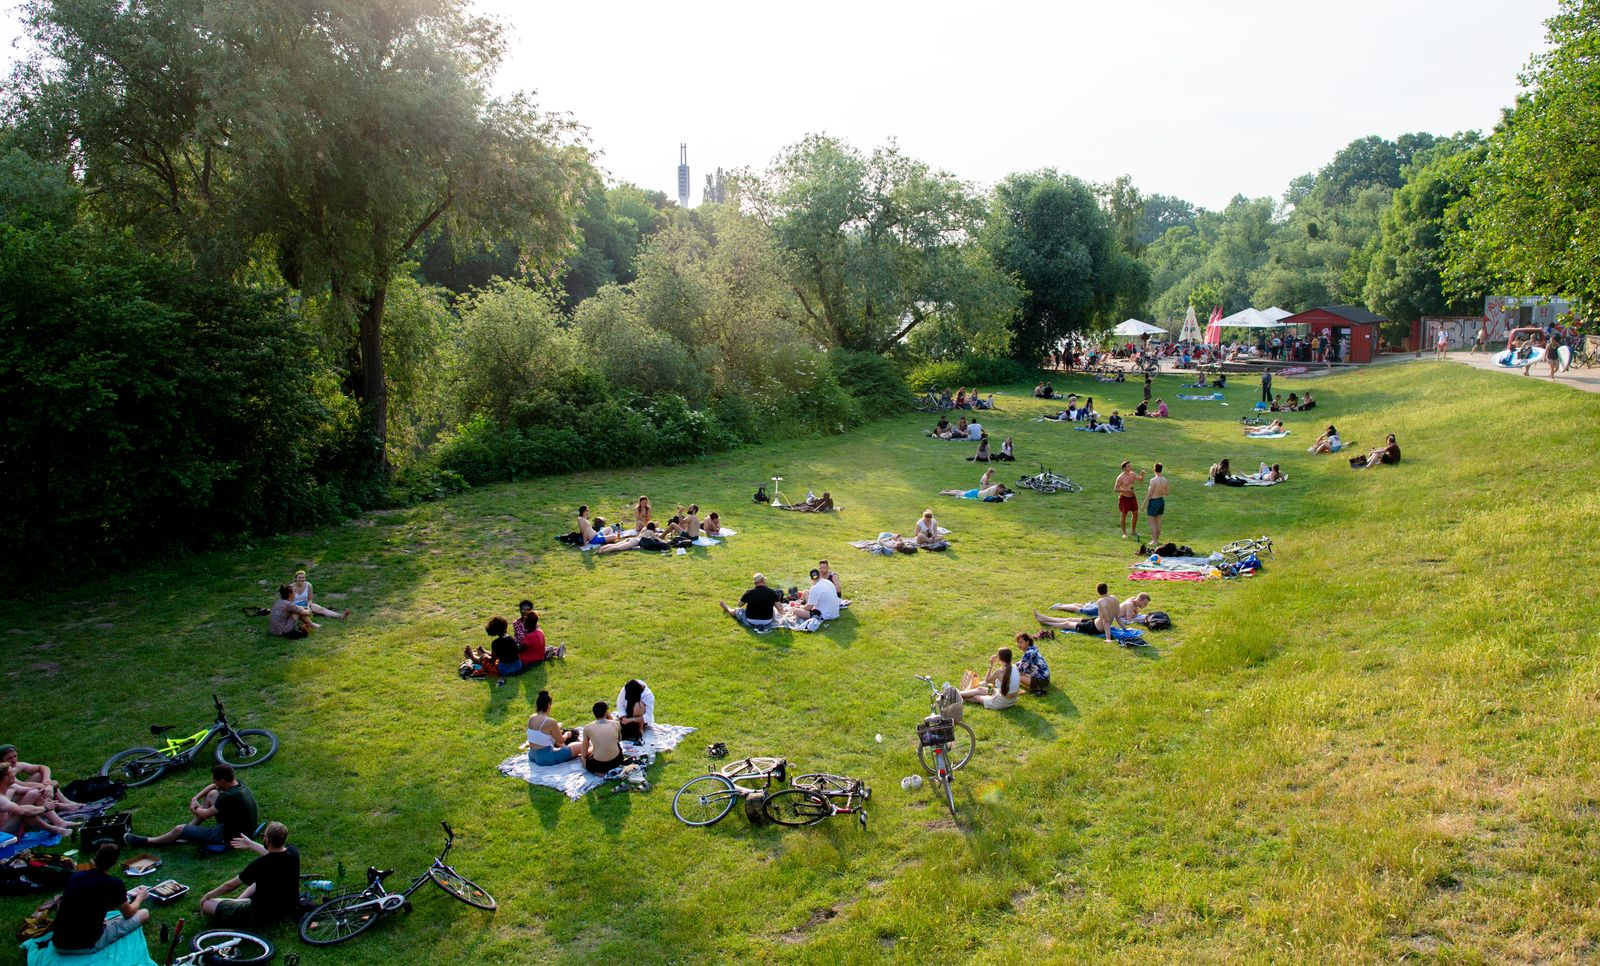 Sommerwetter in Hannover